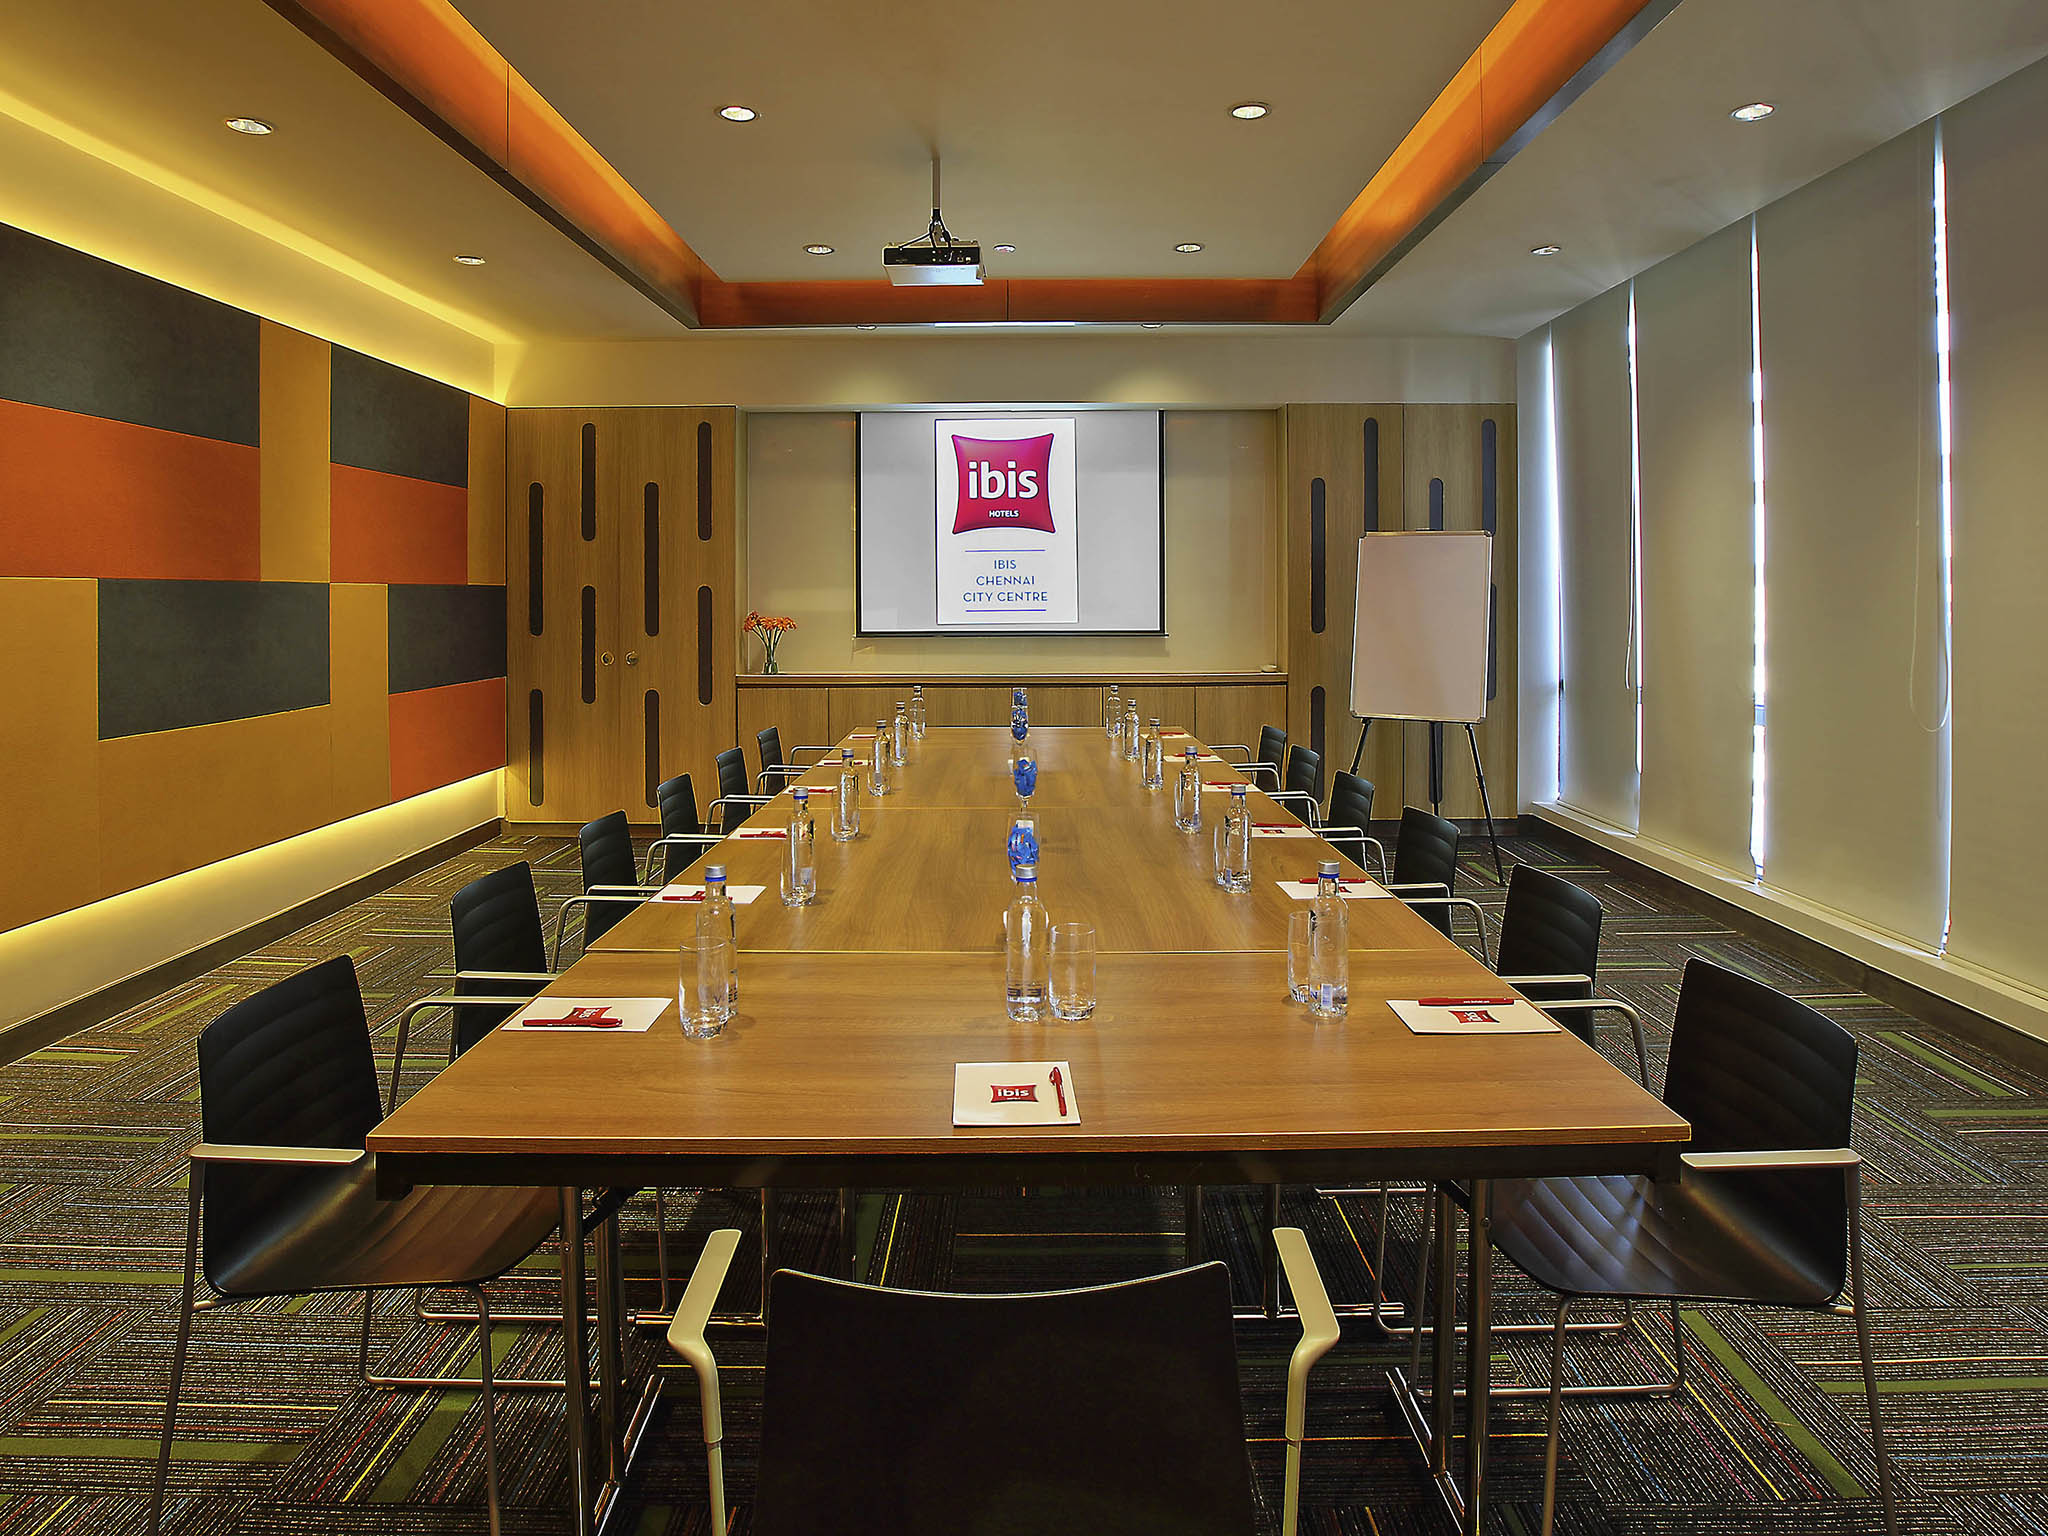 Hotel in Chennai - ibis Chennai City Centre by Accorhotels